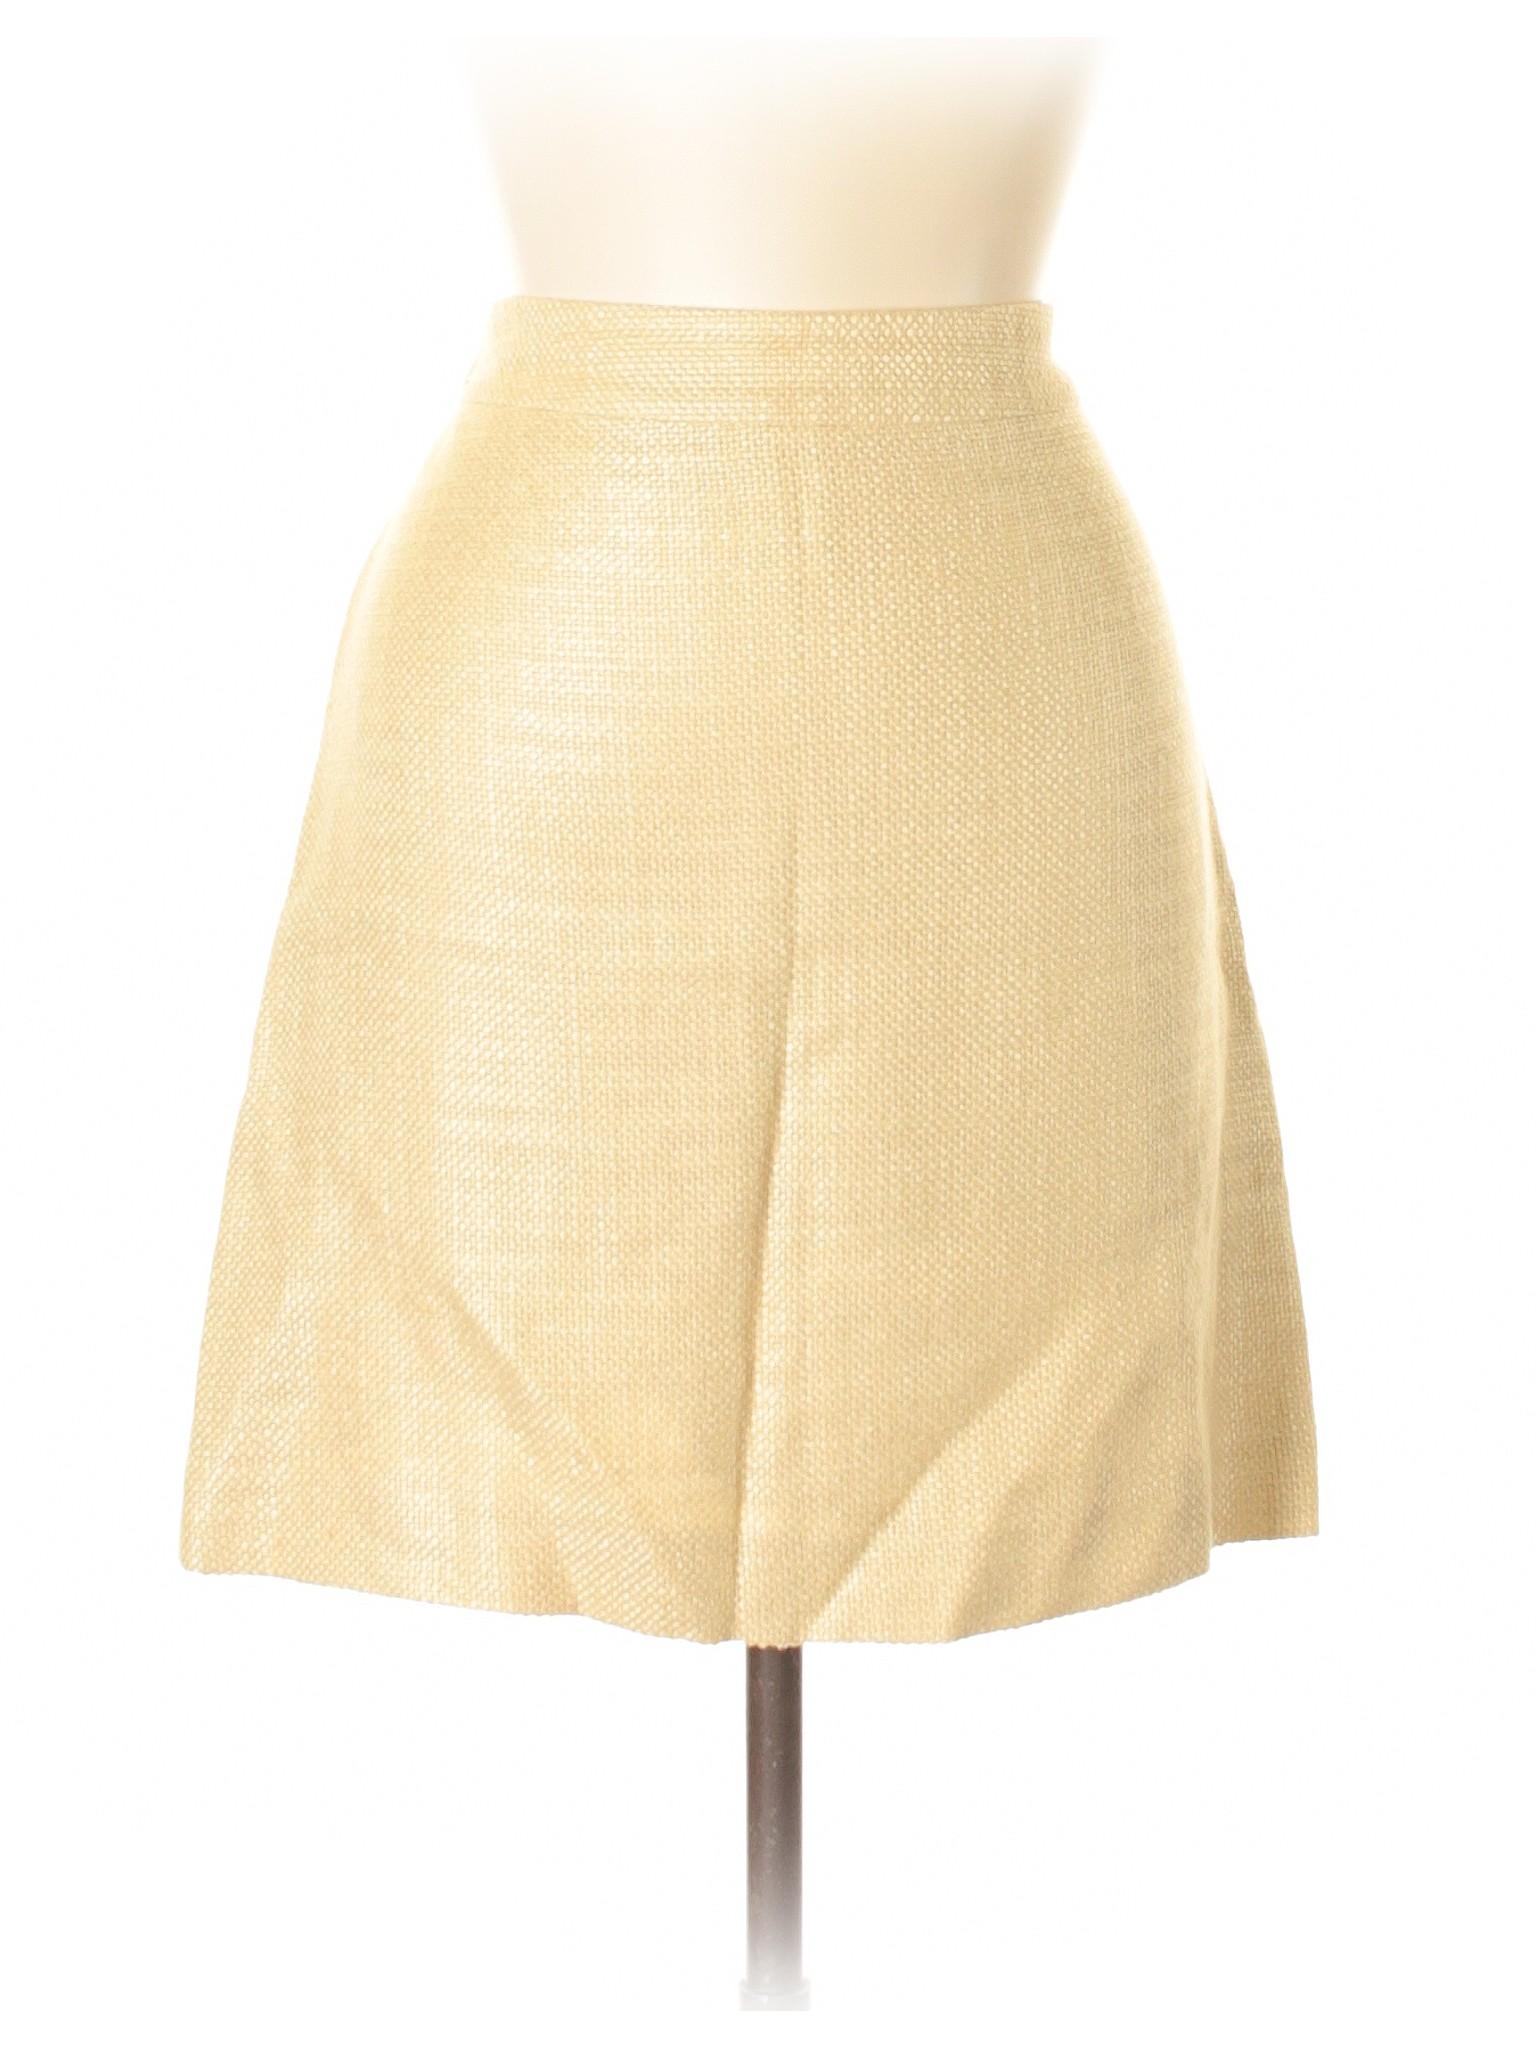 Banana Skirt Republic winter Casual Leisure Cxn5ZwAq